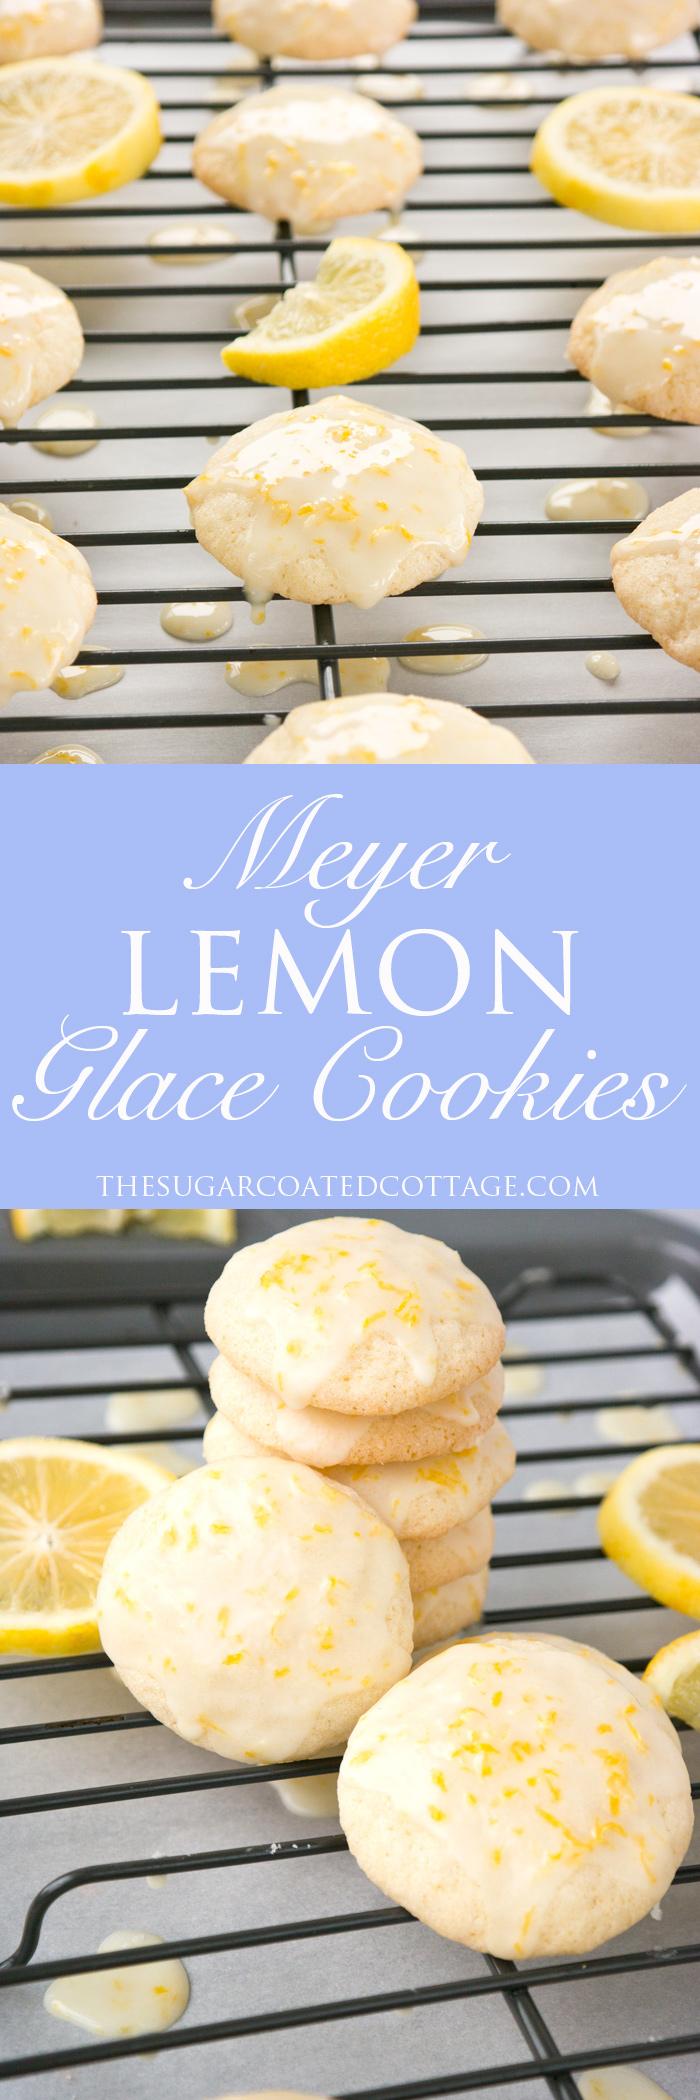 Meyer Lemon Glace Cookies